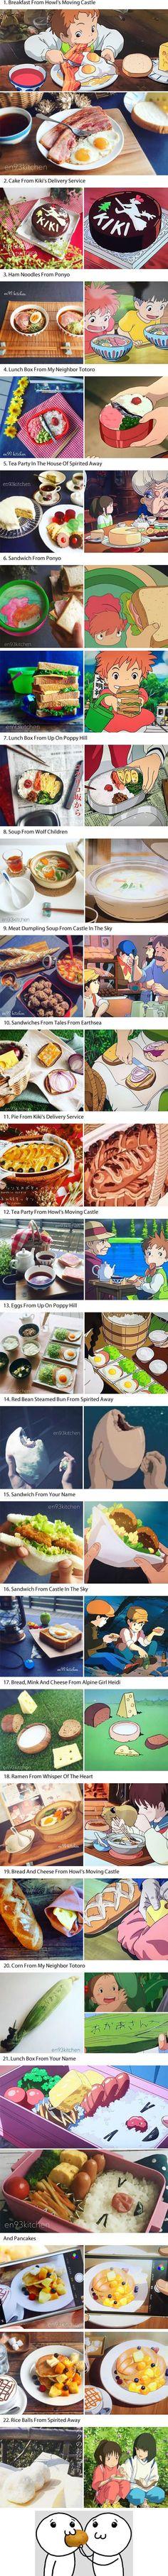 Japanese Woman Recreates The Delicious Food From Studio Ghib. - Japanese Woman Recreates The Delicious Food From Studio Ghibli Films , Totoro, Art Studio Ghibli, Studio Ghibli Movies, Studio Ghibli Quotes, Film Manga, Manga Anime, Anime Films, Anime Art, Hayao Miyazaki